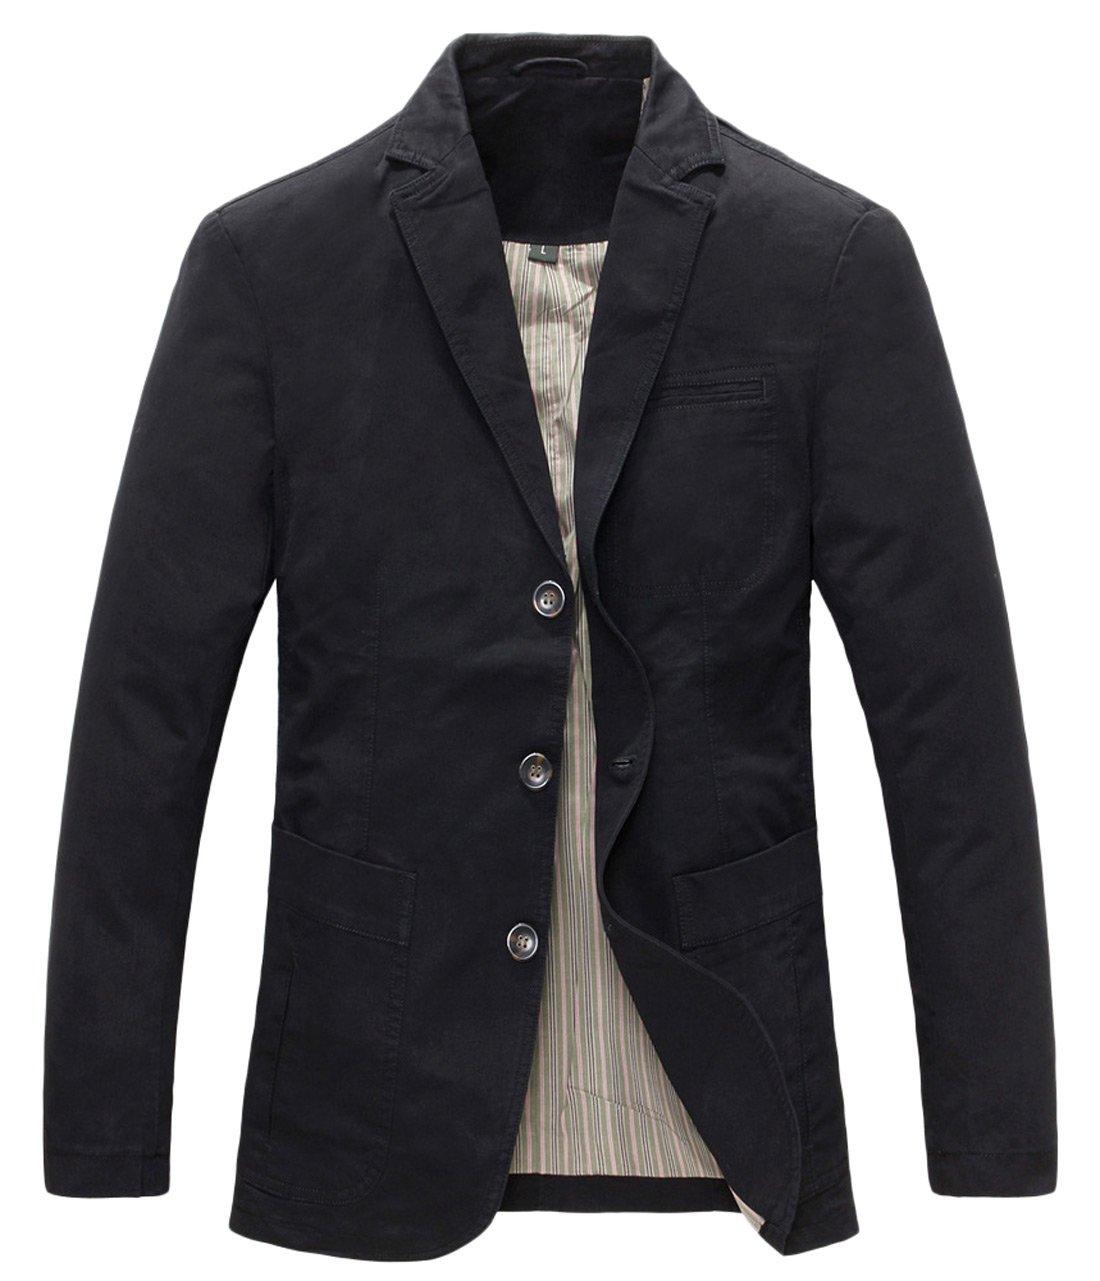 Chouyatou Men's Casual Three-Button Stripe Lined Cotton Twill Suit Jacket (Medium, Black)